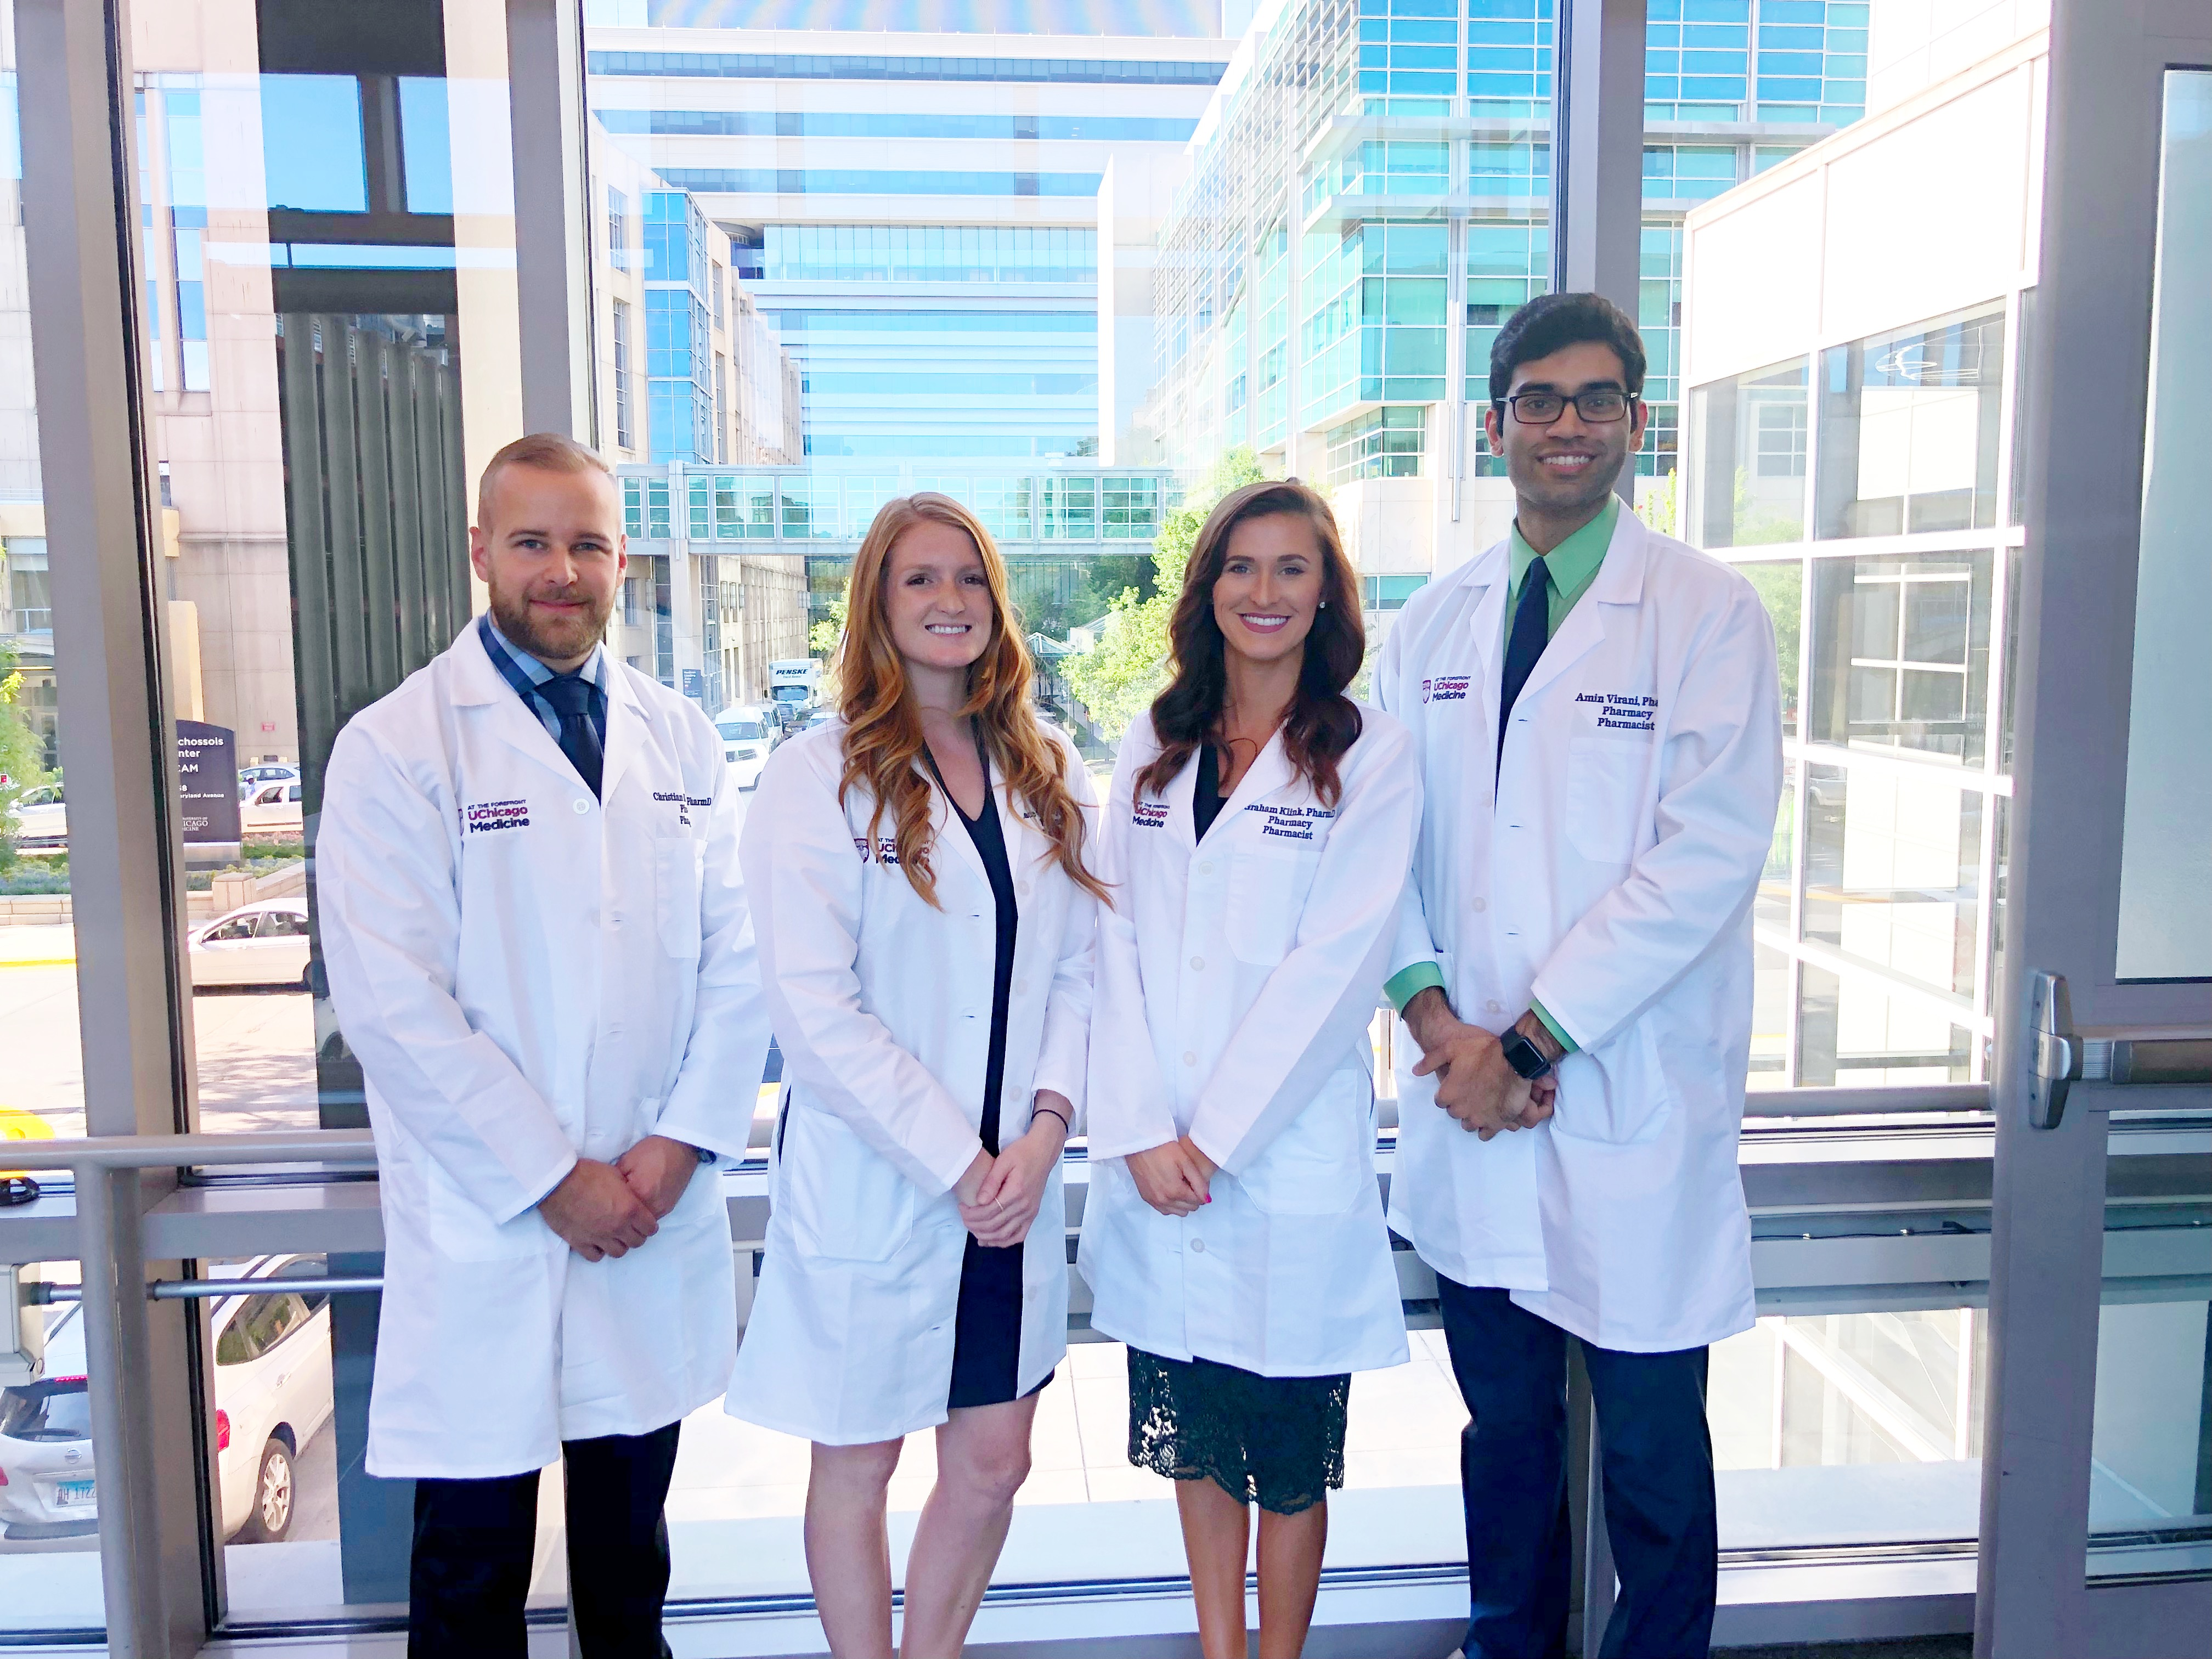 2018-2019 Residents | University of Chicago Medicine Phamacy